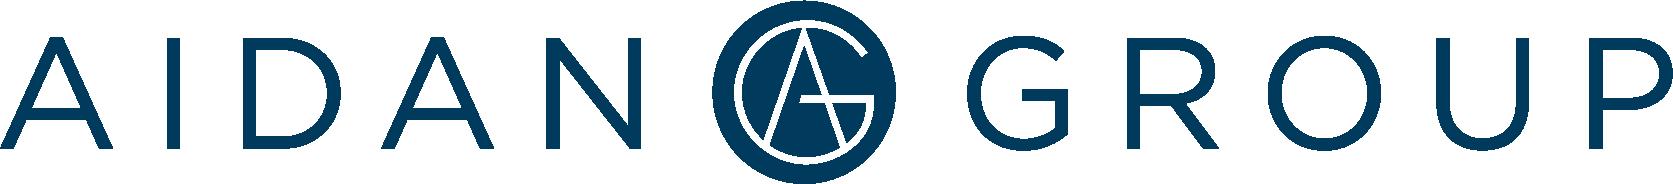 The Aidan Group